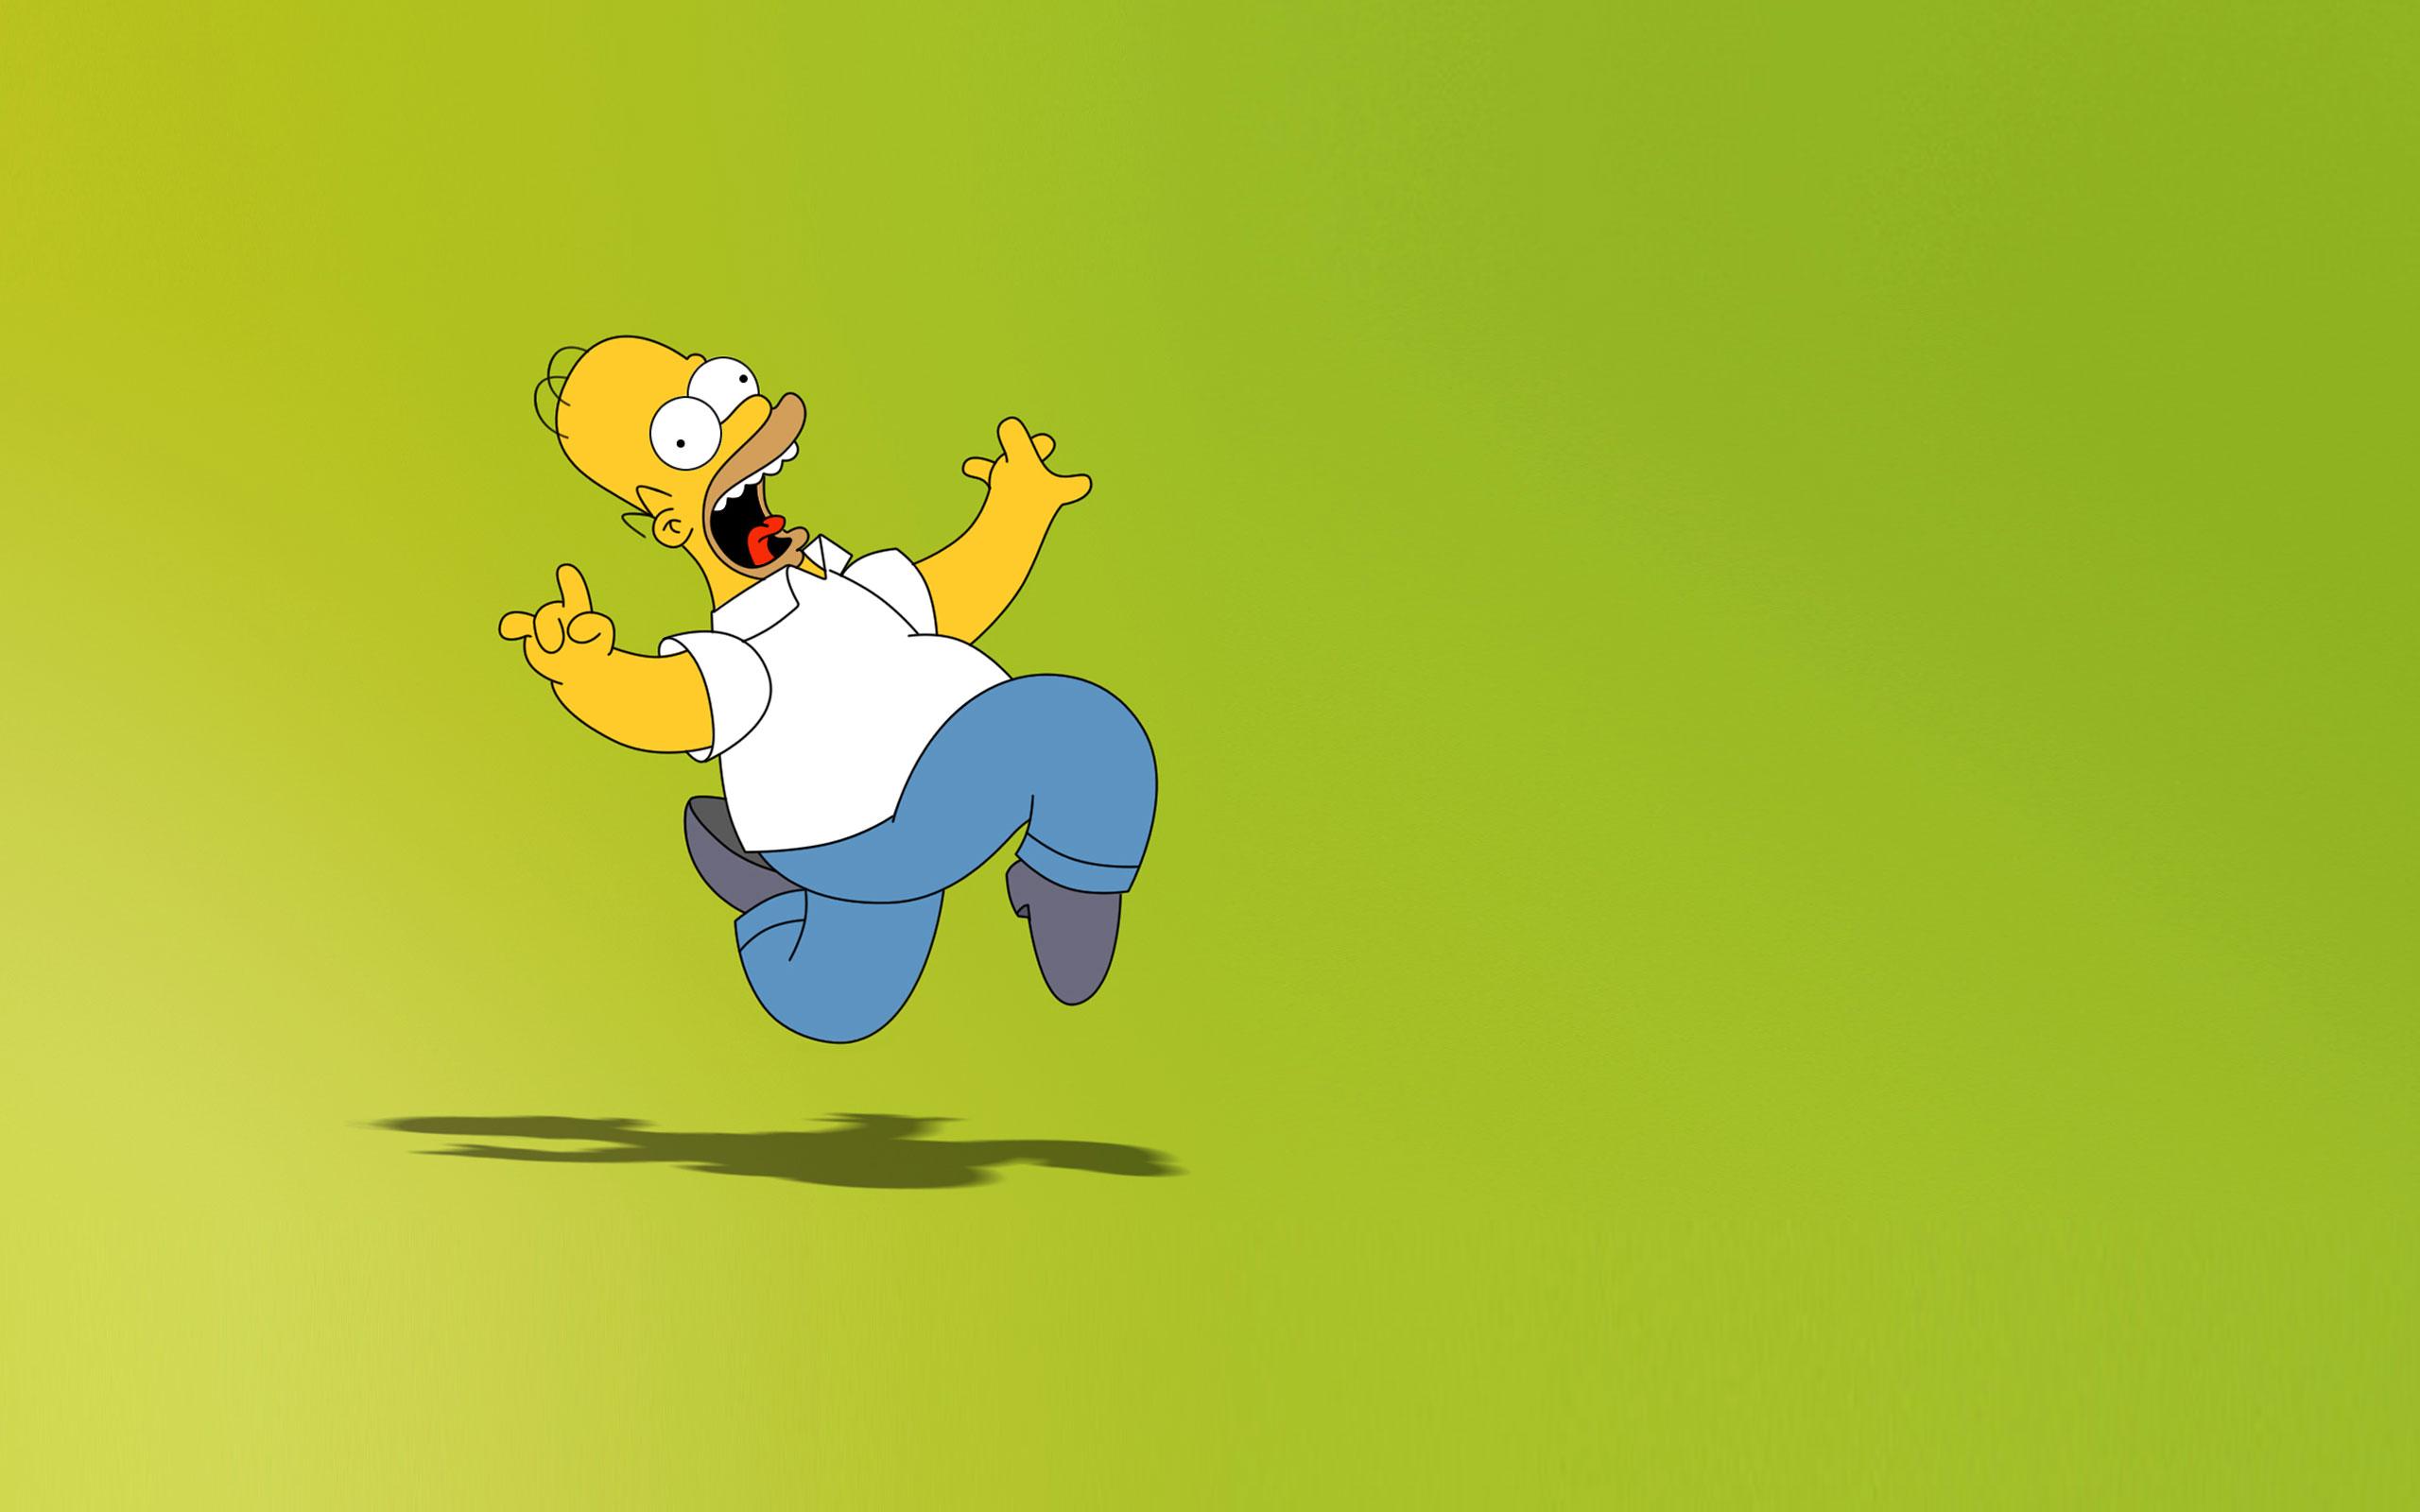 The Simpsons Wallpaper 2019 2560 x 1600   WallpaperLayercom 2560x1600